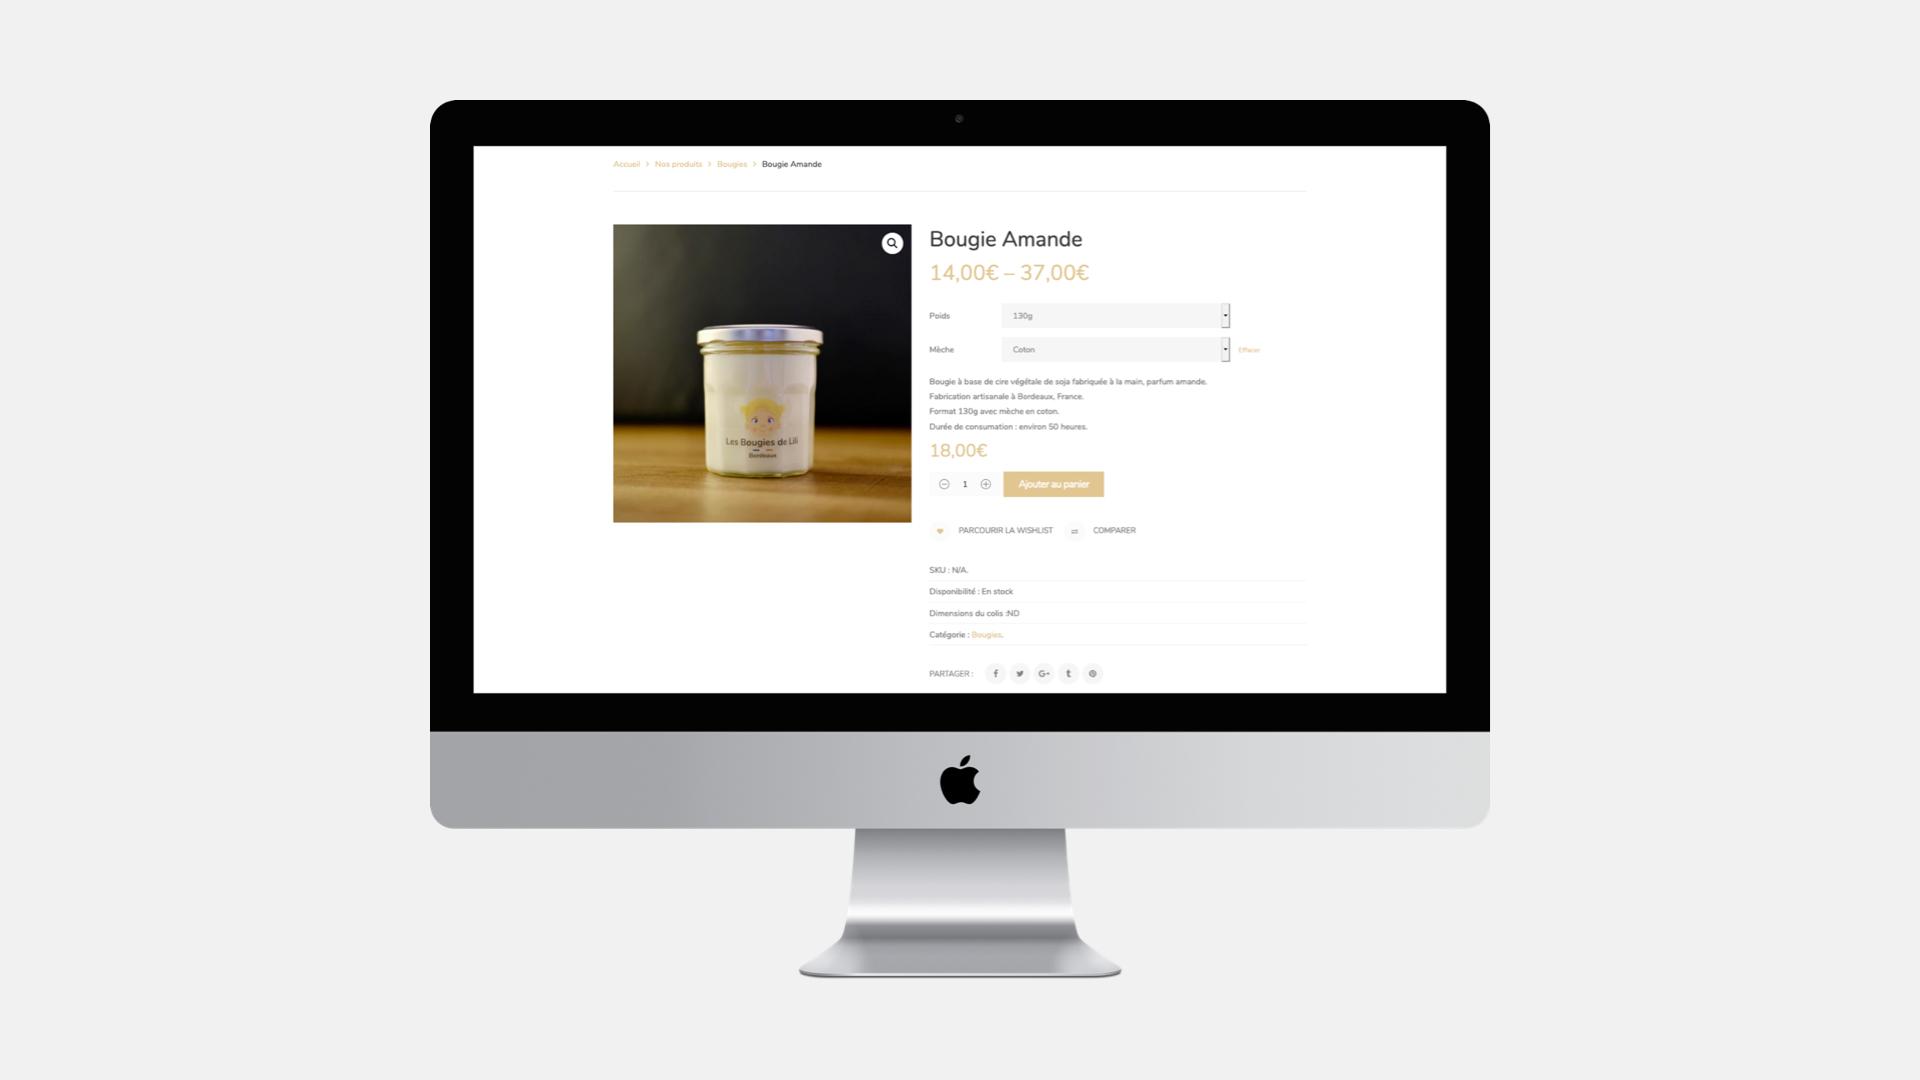 lesbougiesdelili-site-ecommerce-developpeur-freelance-bordeaux-3